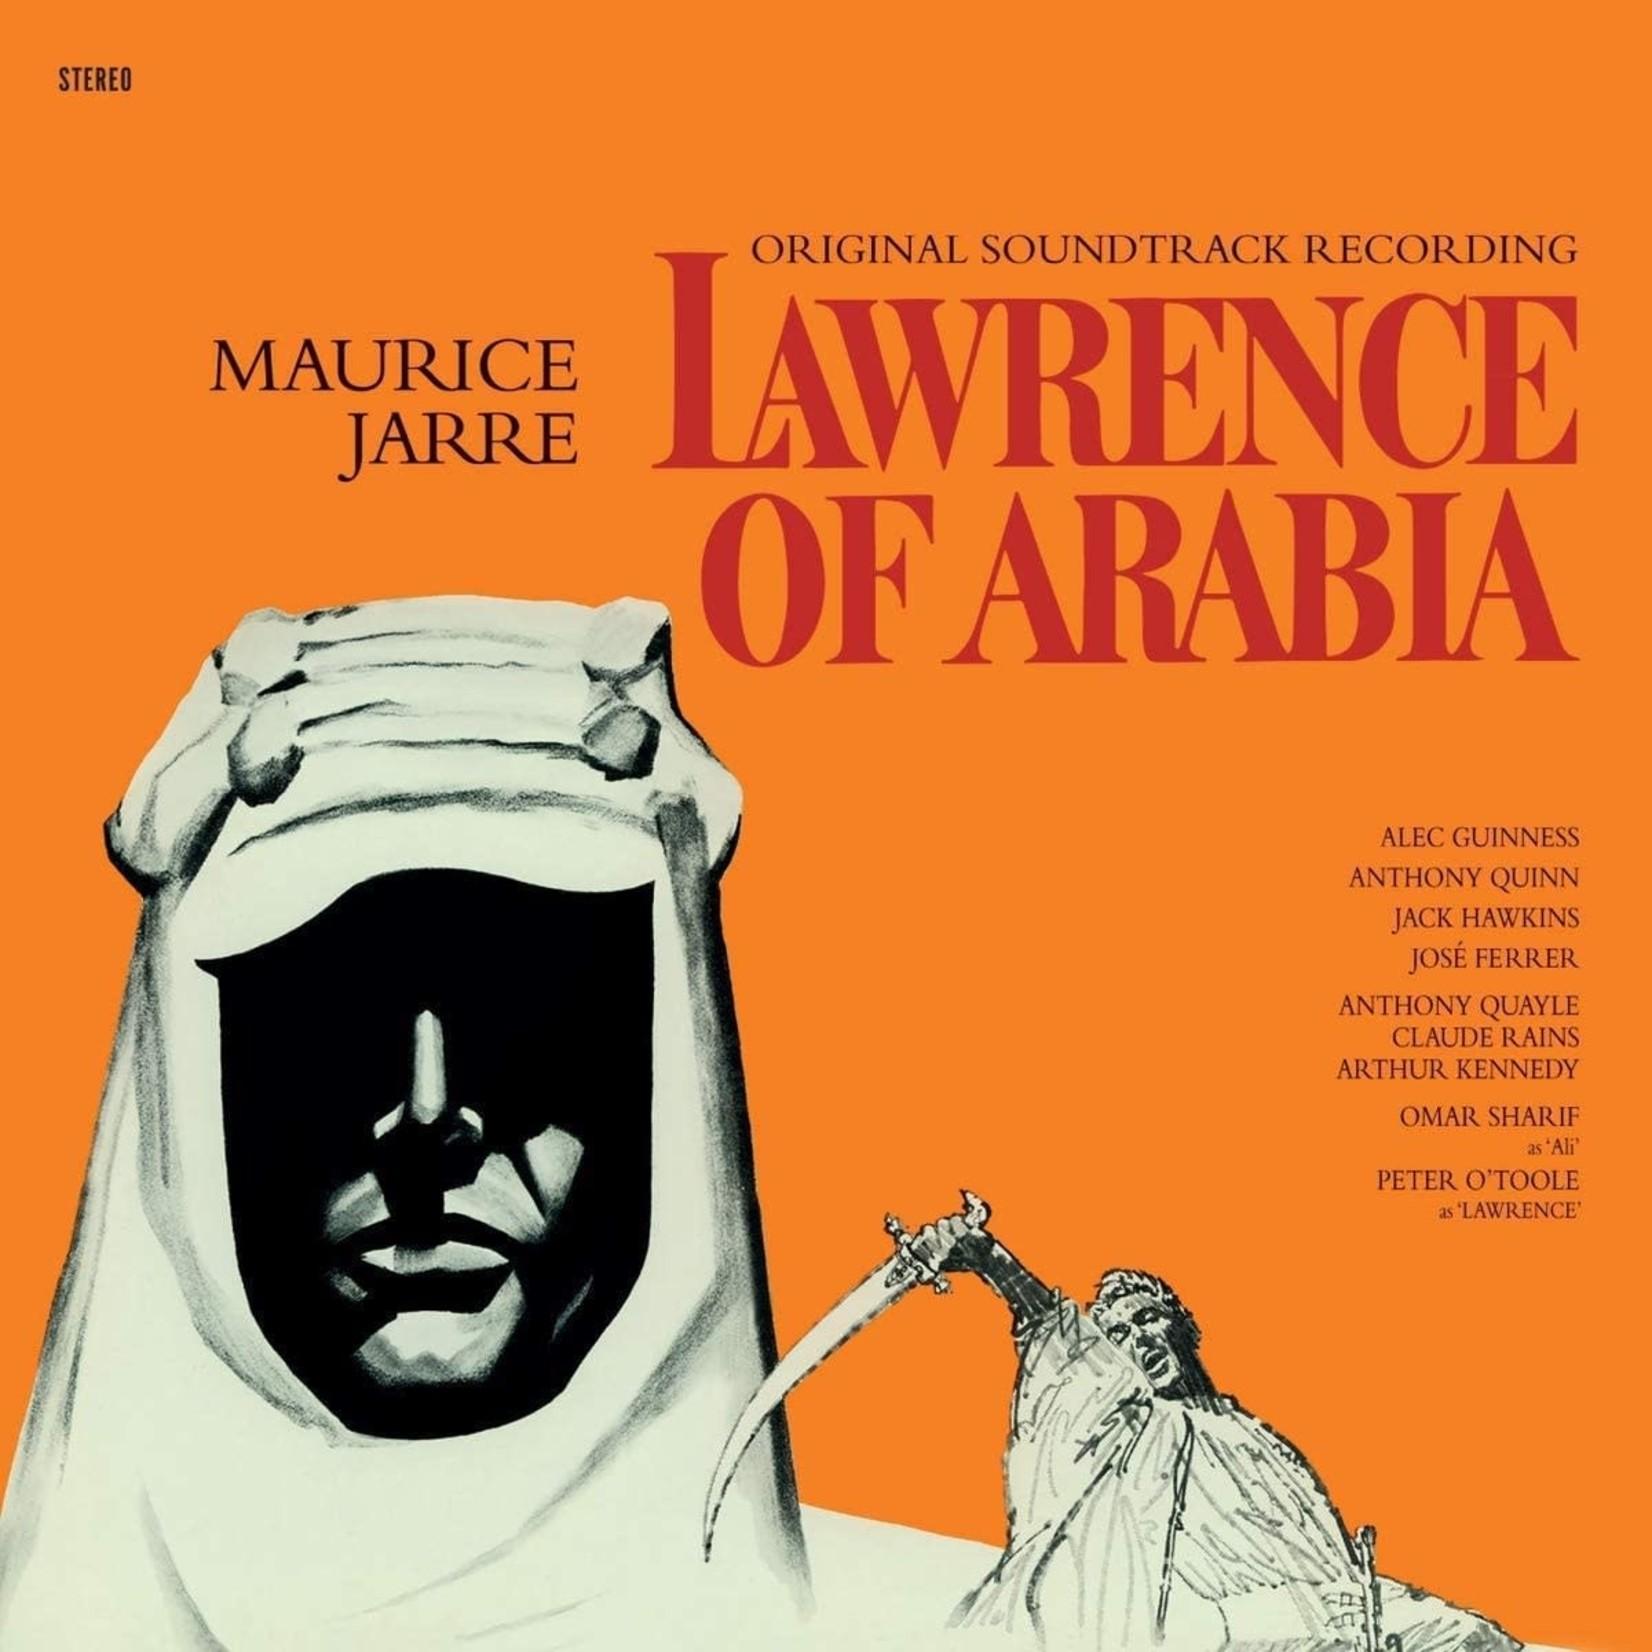 [Vintage] Jarre, Maurice: Lawrence of Arabia Motion Picture (Soundtrack)